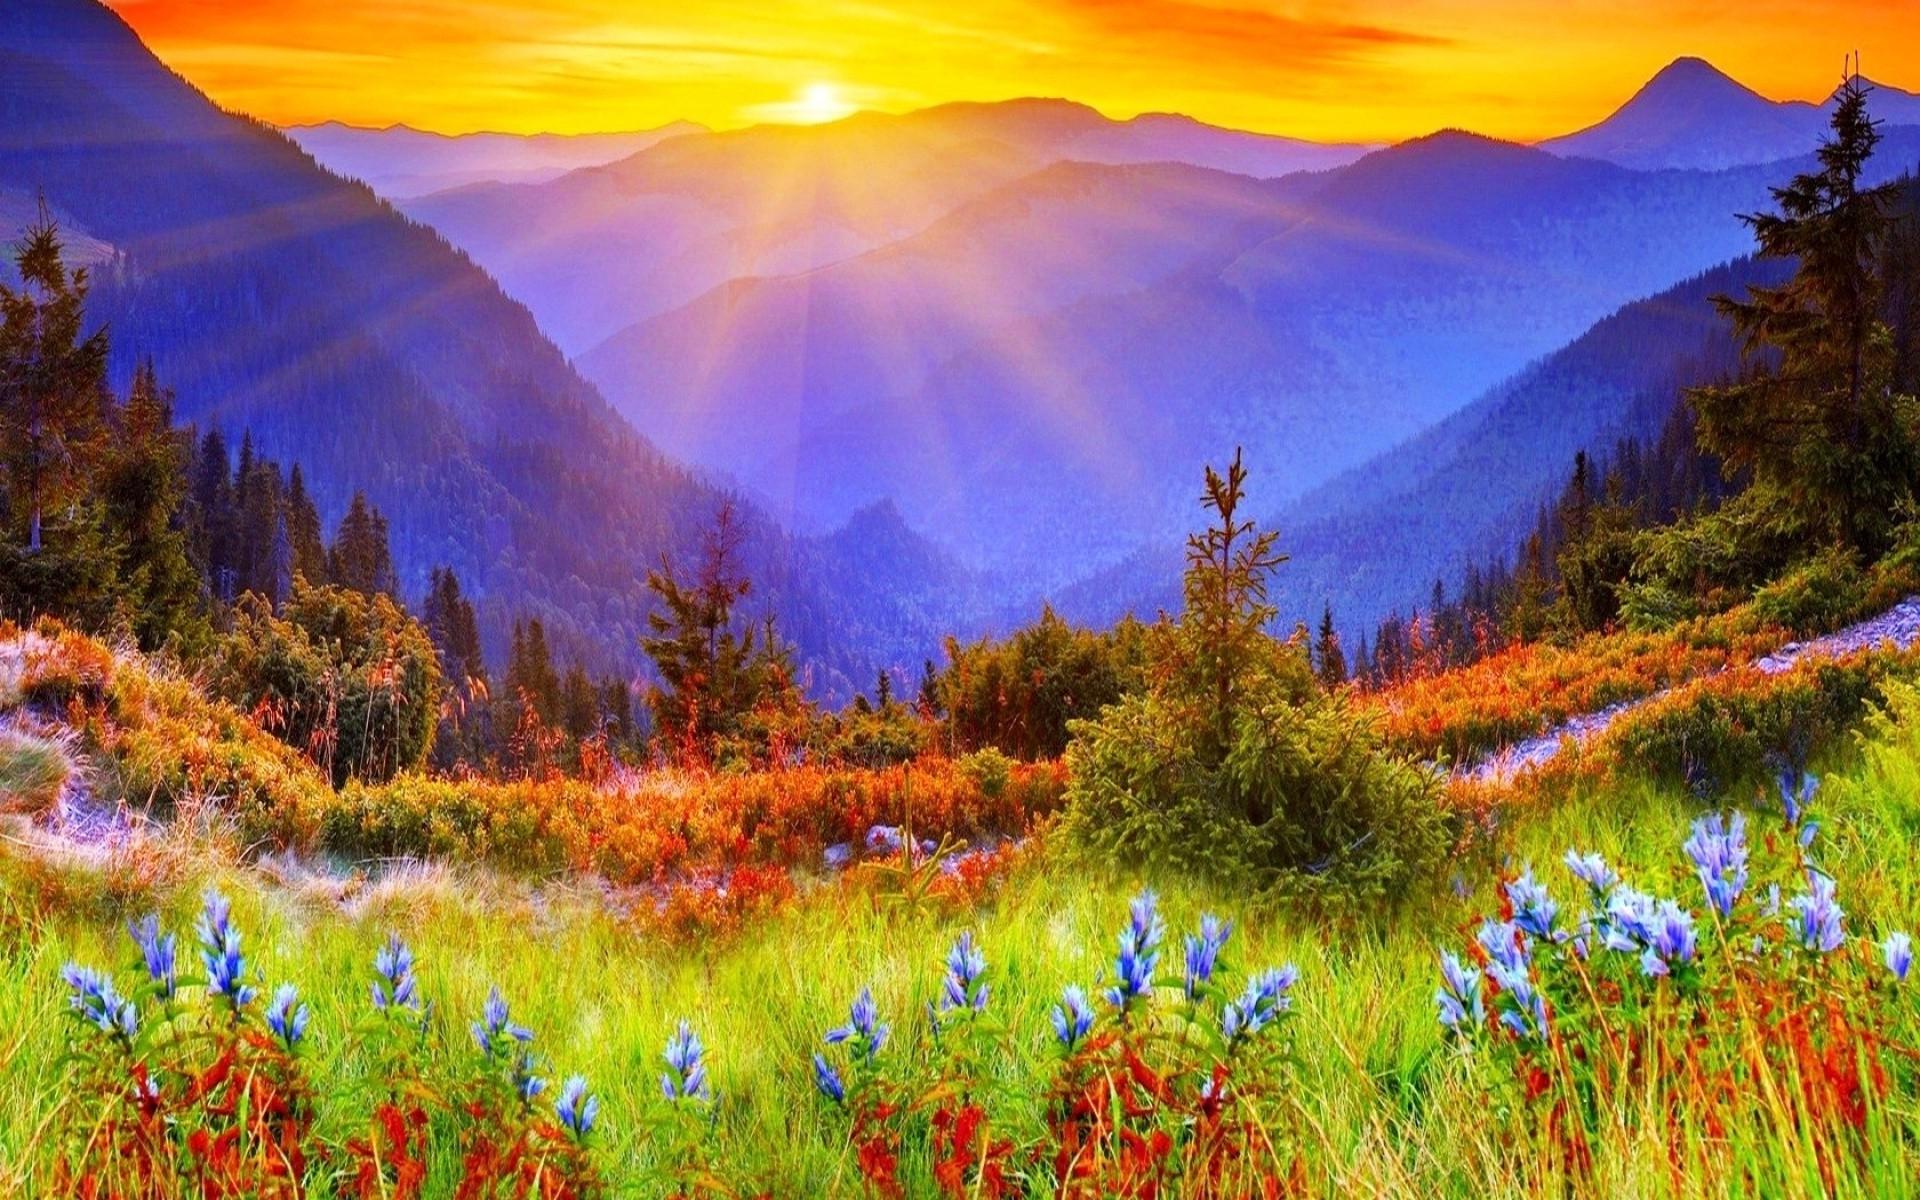 free desktop wallpaper,natural landscape,nature,wilderness,natural environment,morning